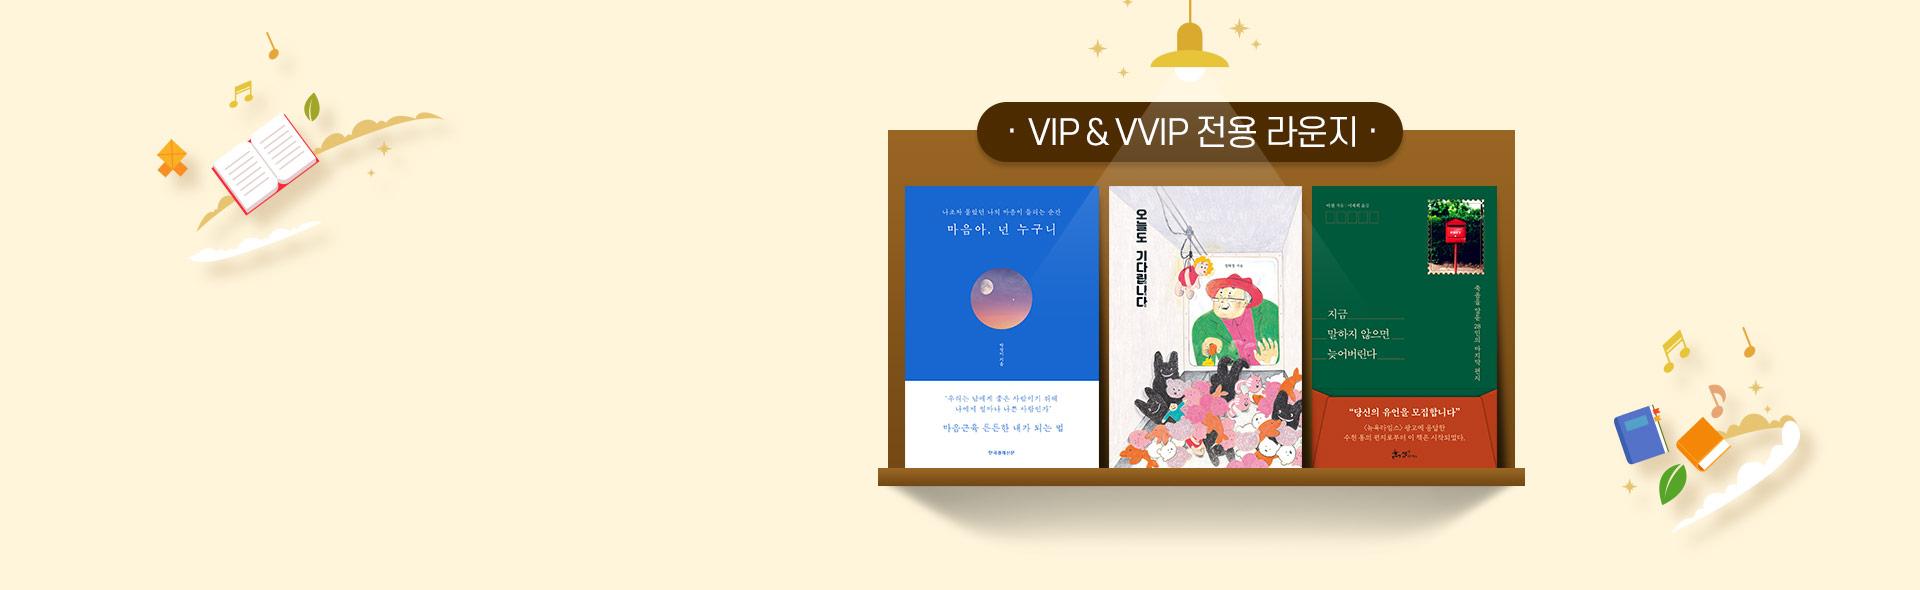 [VIP 라운지] 네오팜샵 BOOK EVENT 이미지 6